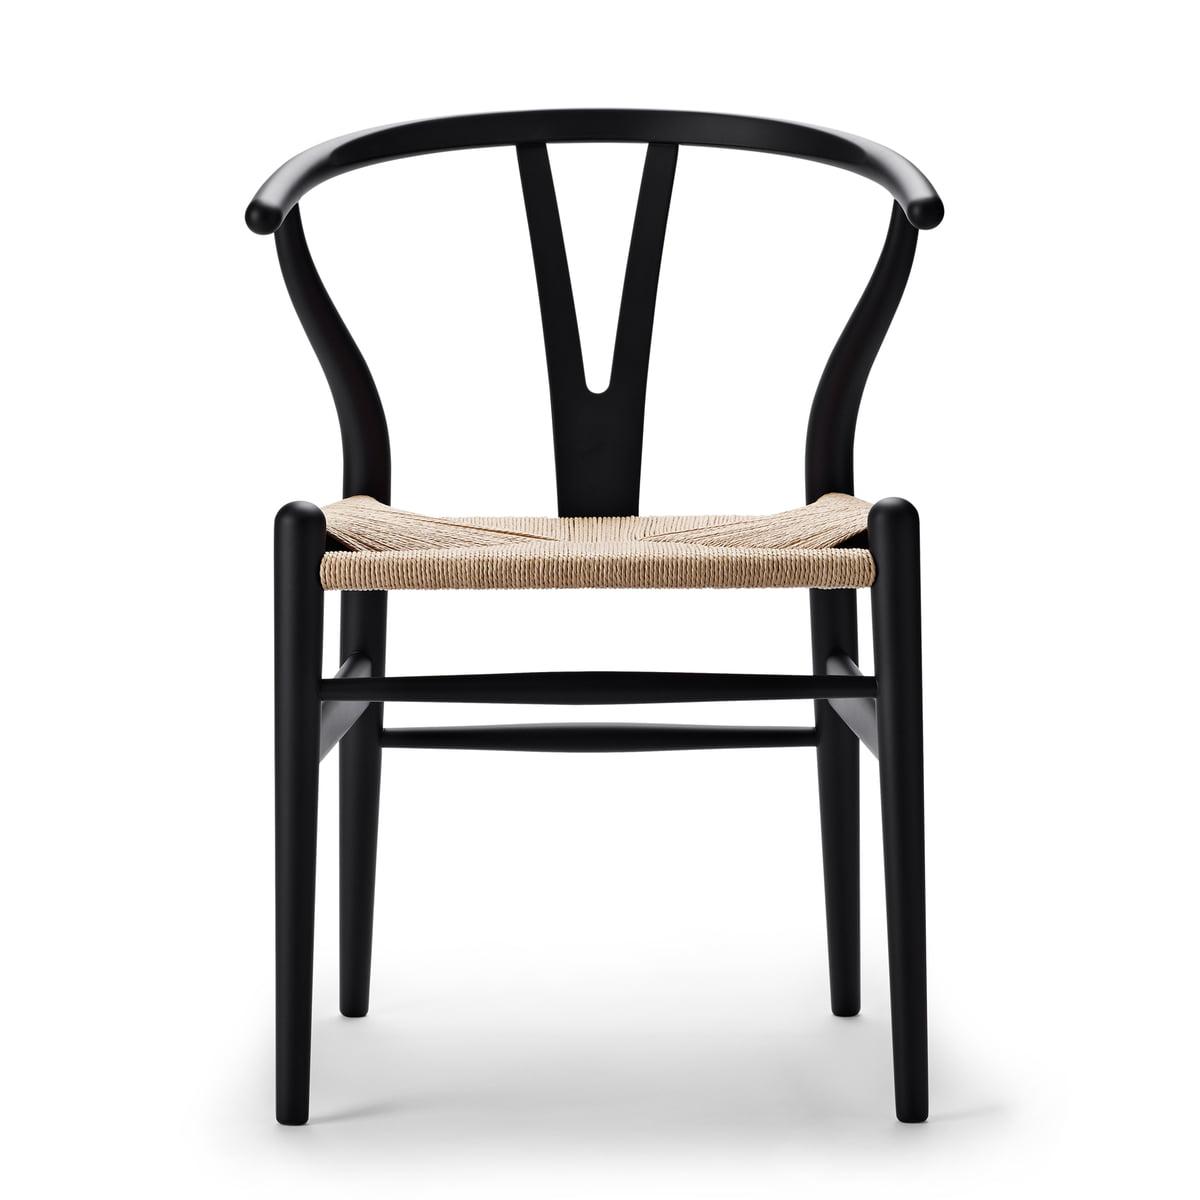 Carl Hansen - CH24 Wishbone Chair, soft black / Naturgeflecht (Limited Edition)